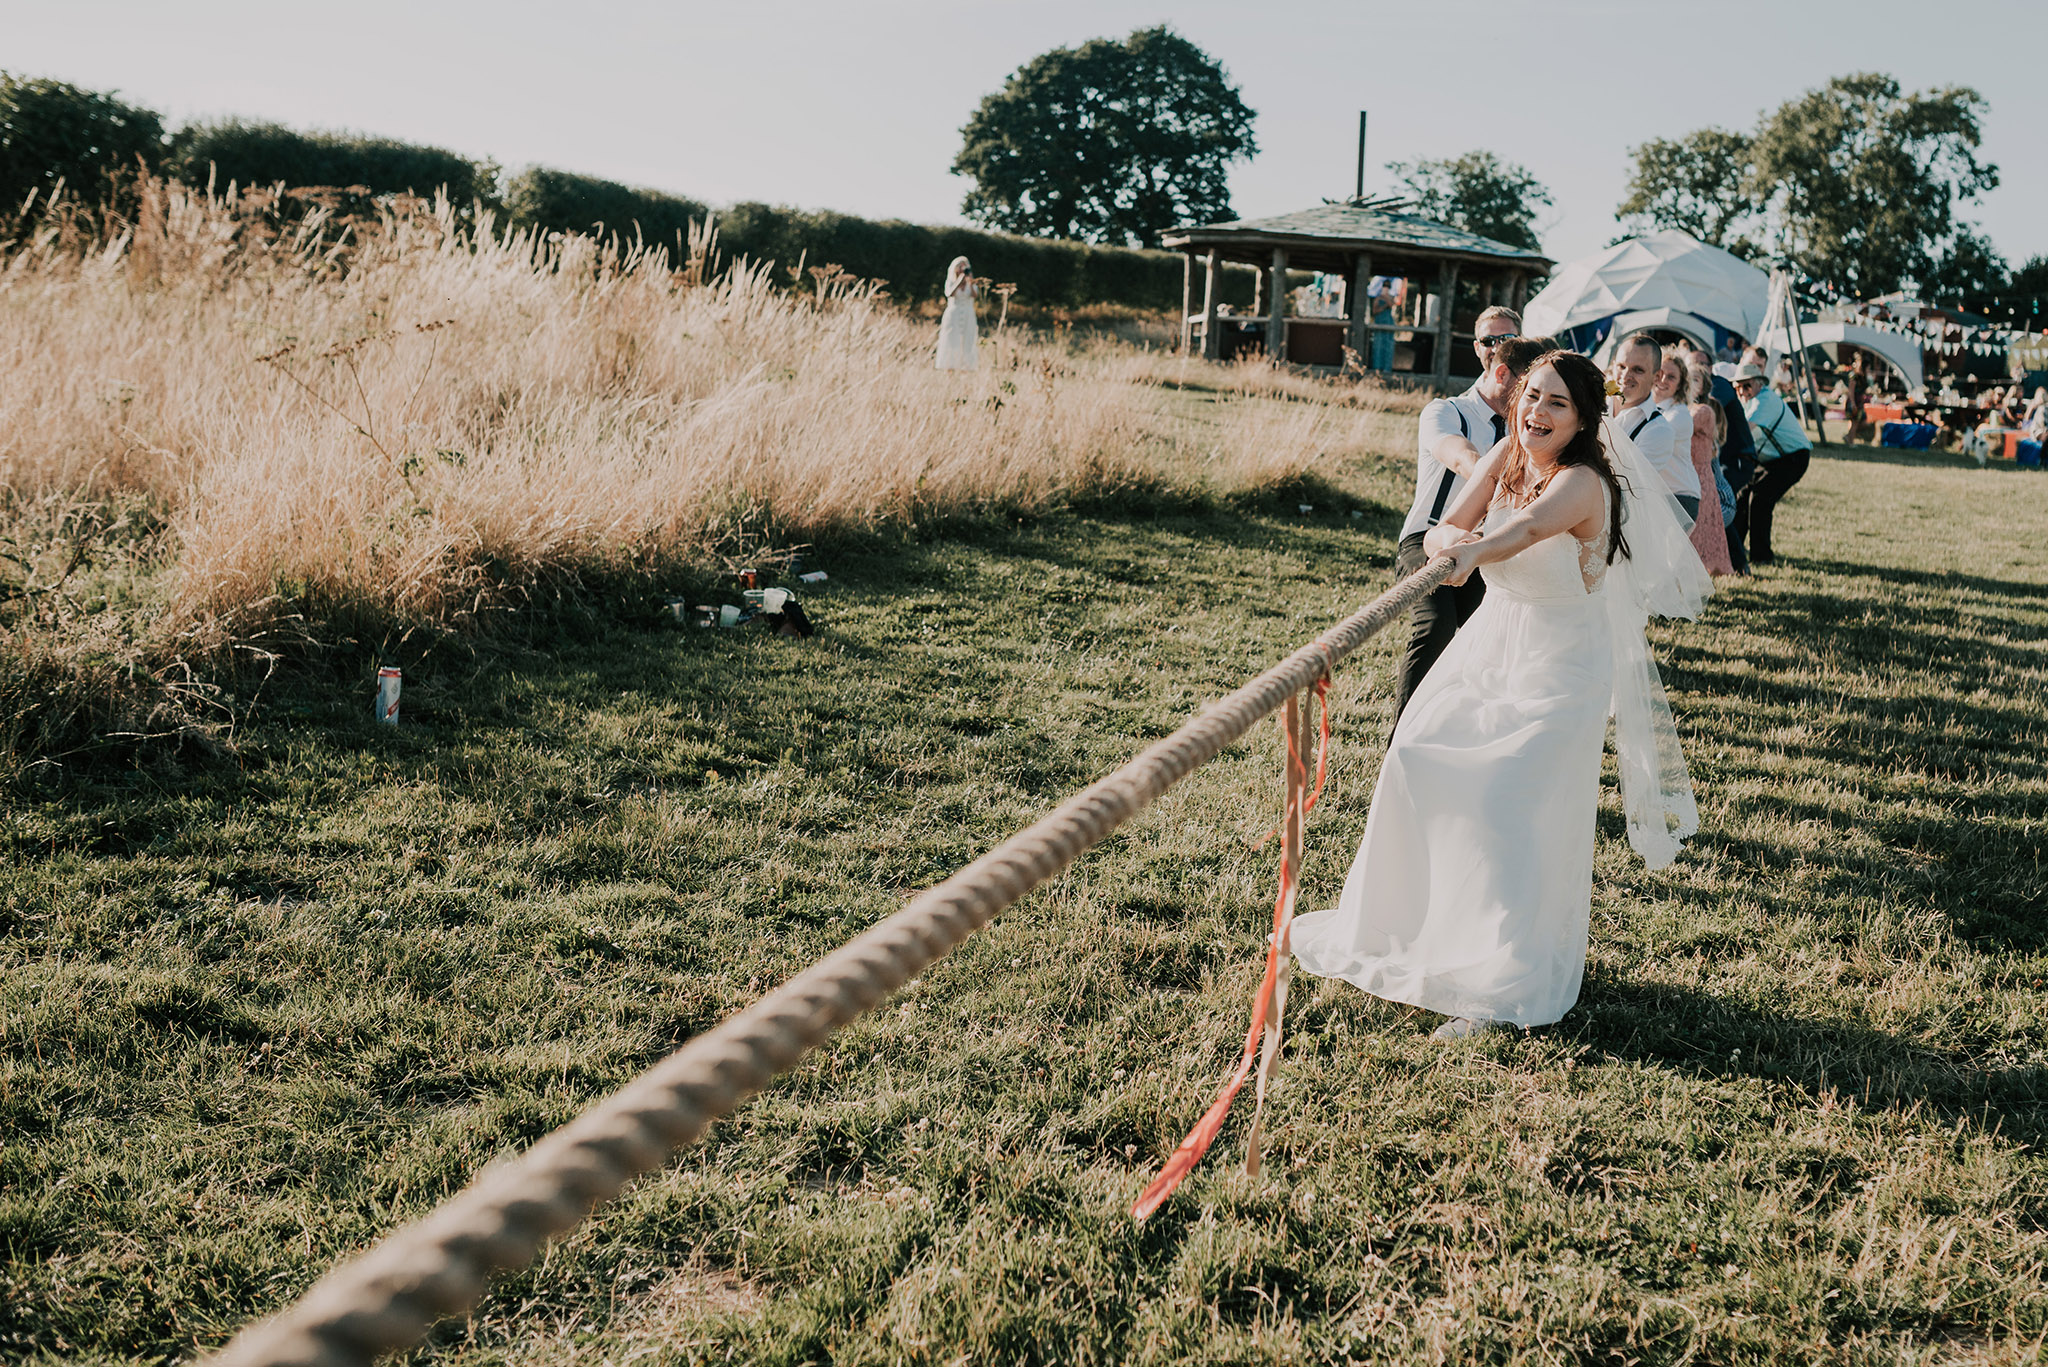 scott-stockwell-photography-wedding-32.jpg